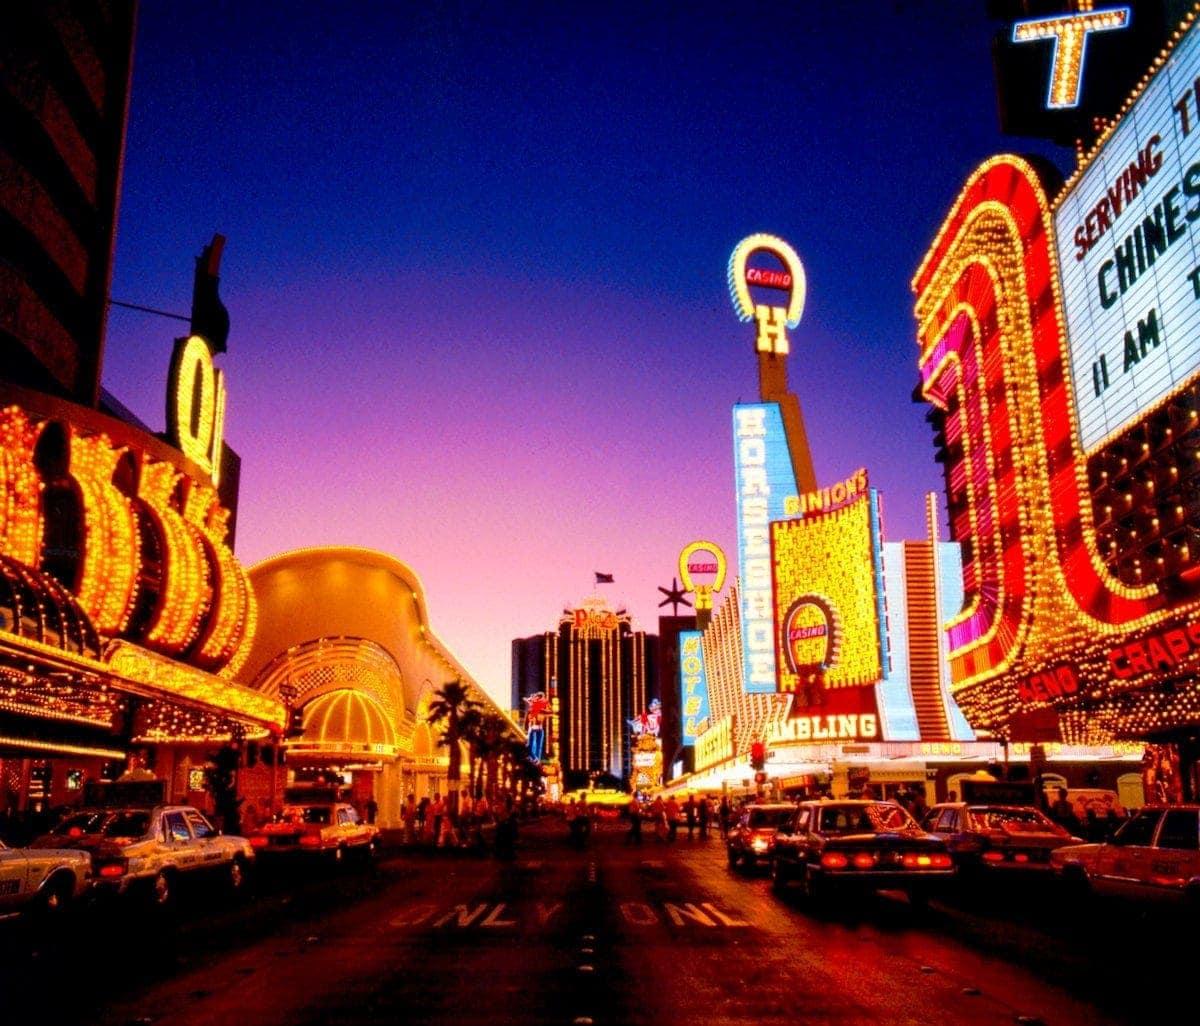 Las Vegas NV - 1970s - Jerry Coli Dreamstime